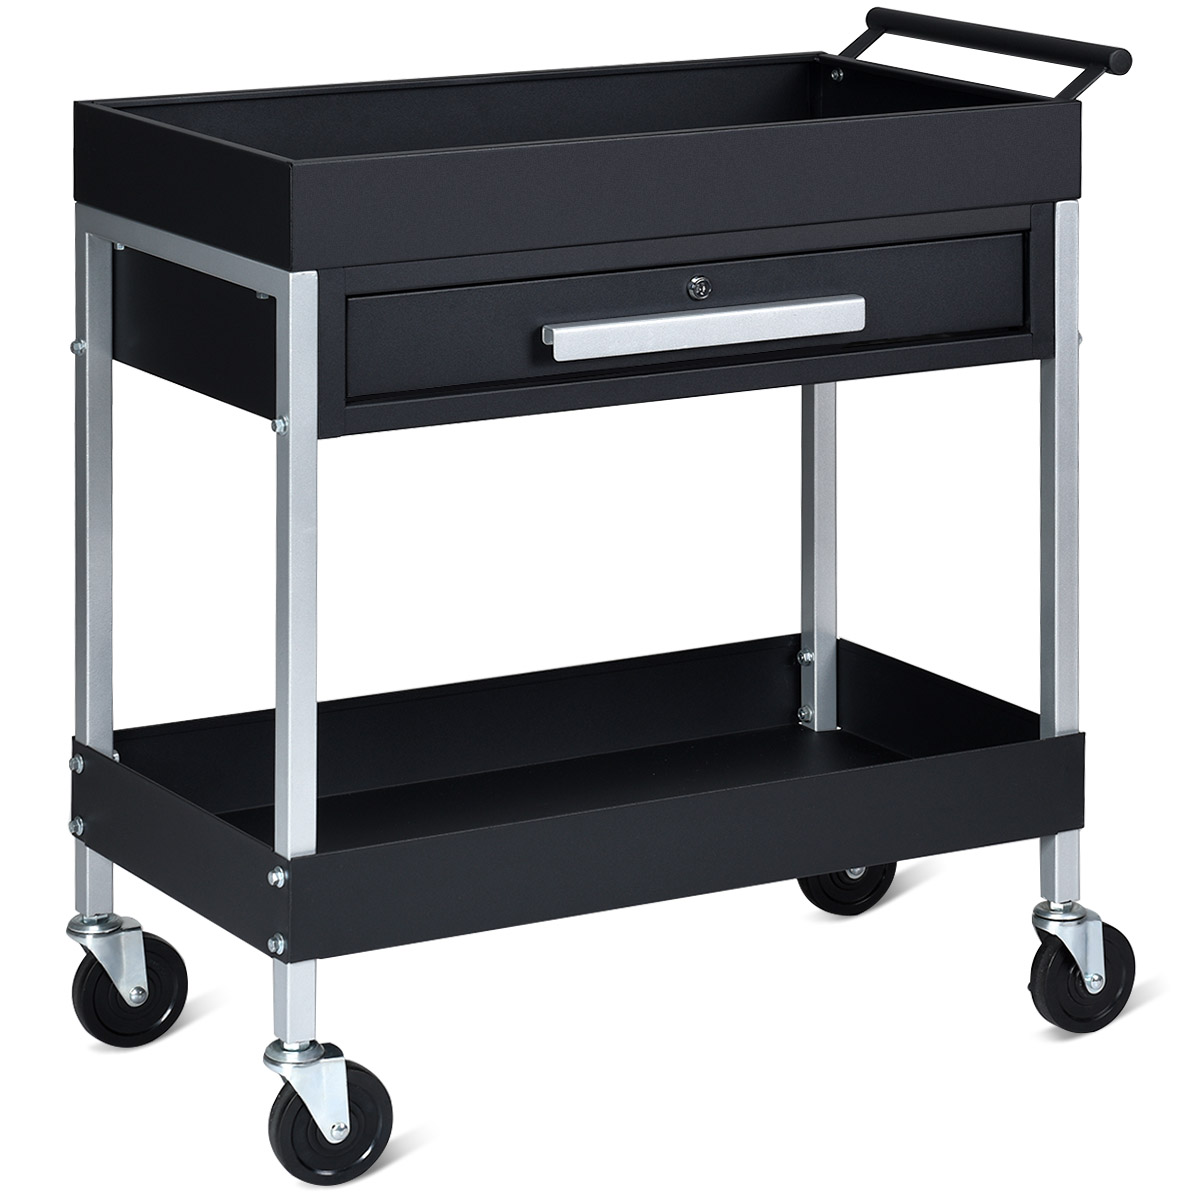 2 Shelf Tool Cart Utility Cart Service Cart Heavy Duty With Lock Drawer & Wheels